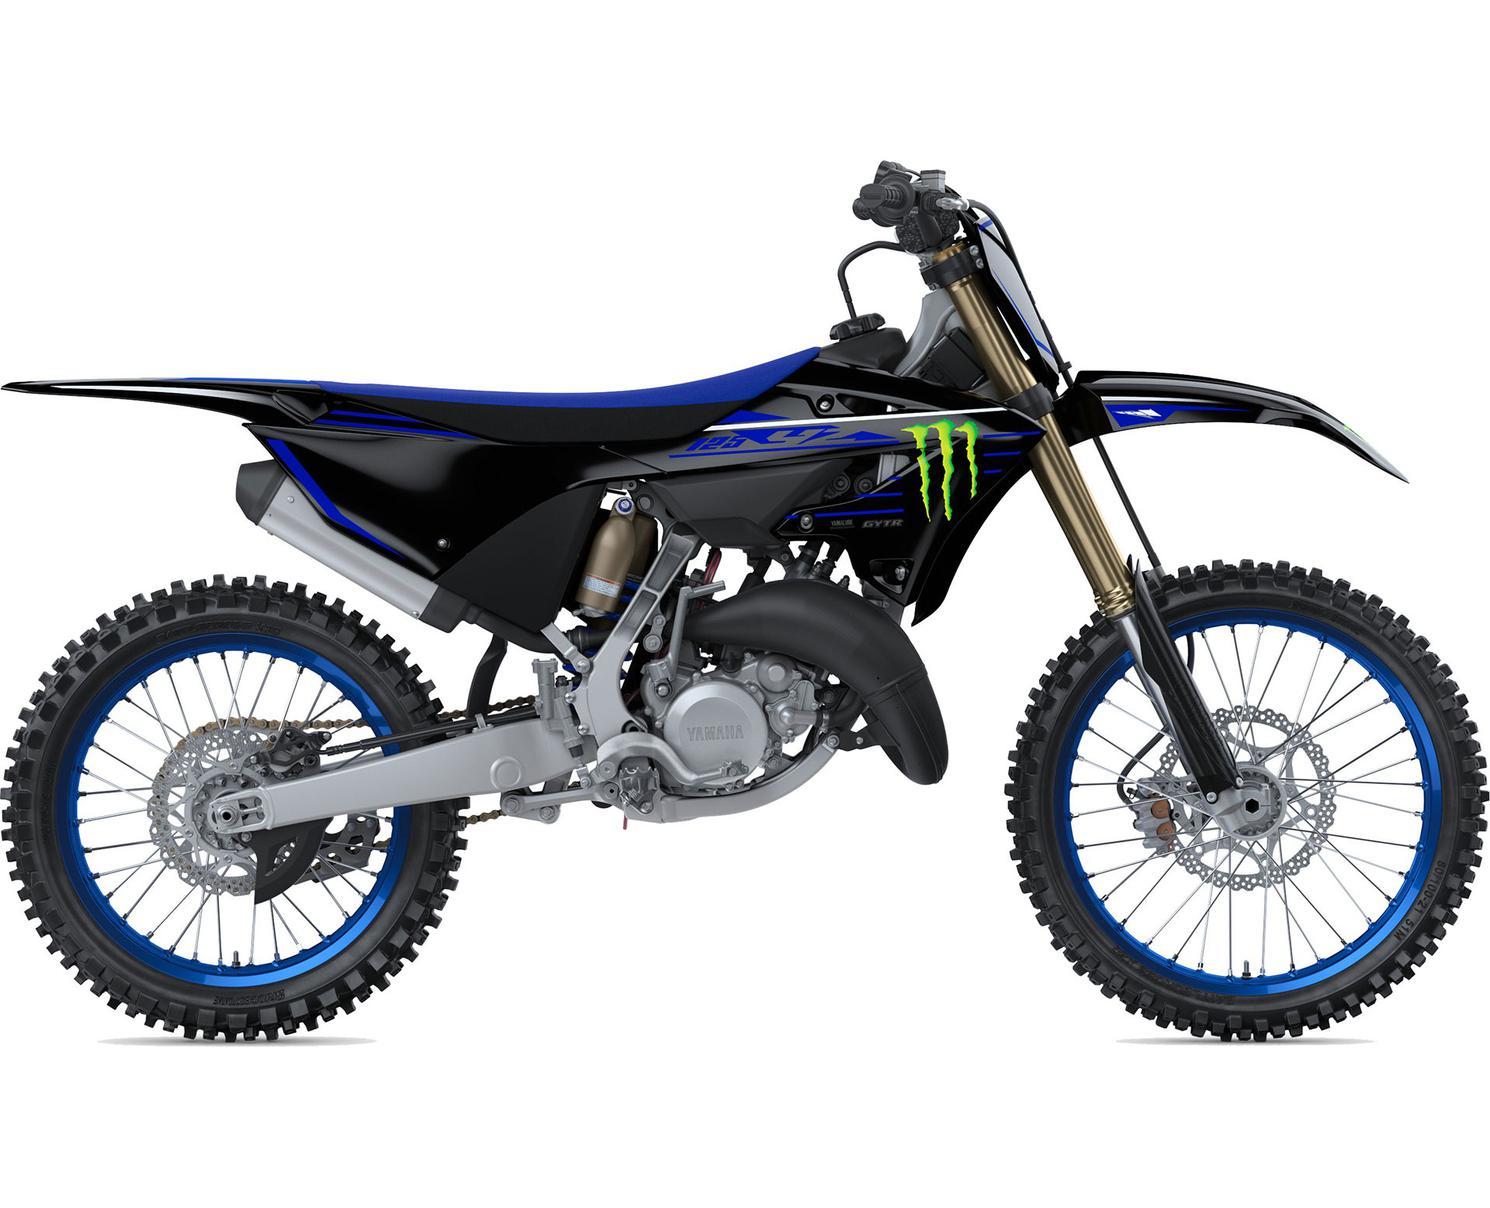 Yamaha YZ125 Motif Monster Energy Yamaha Racing 2022